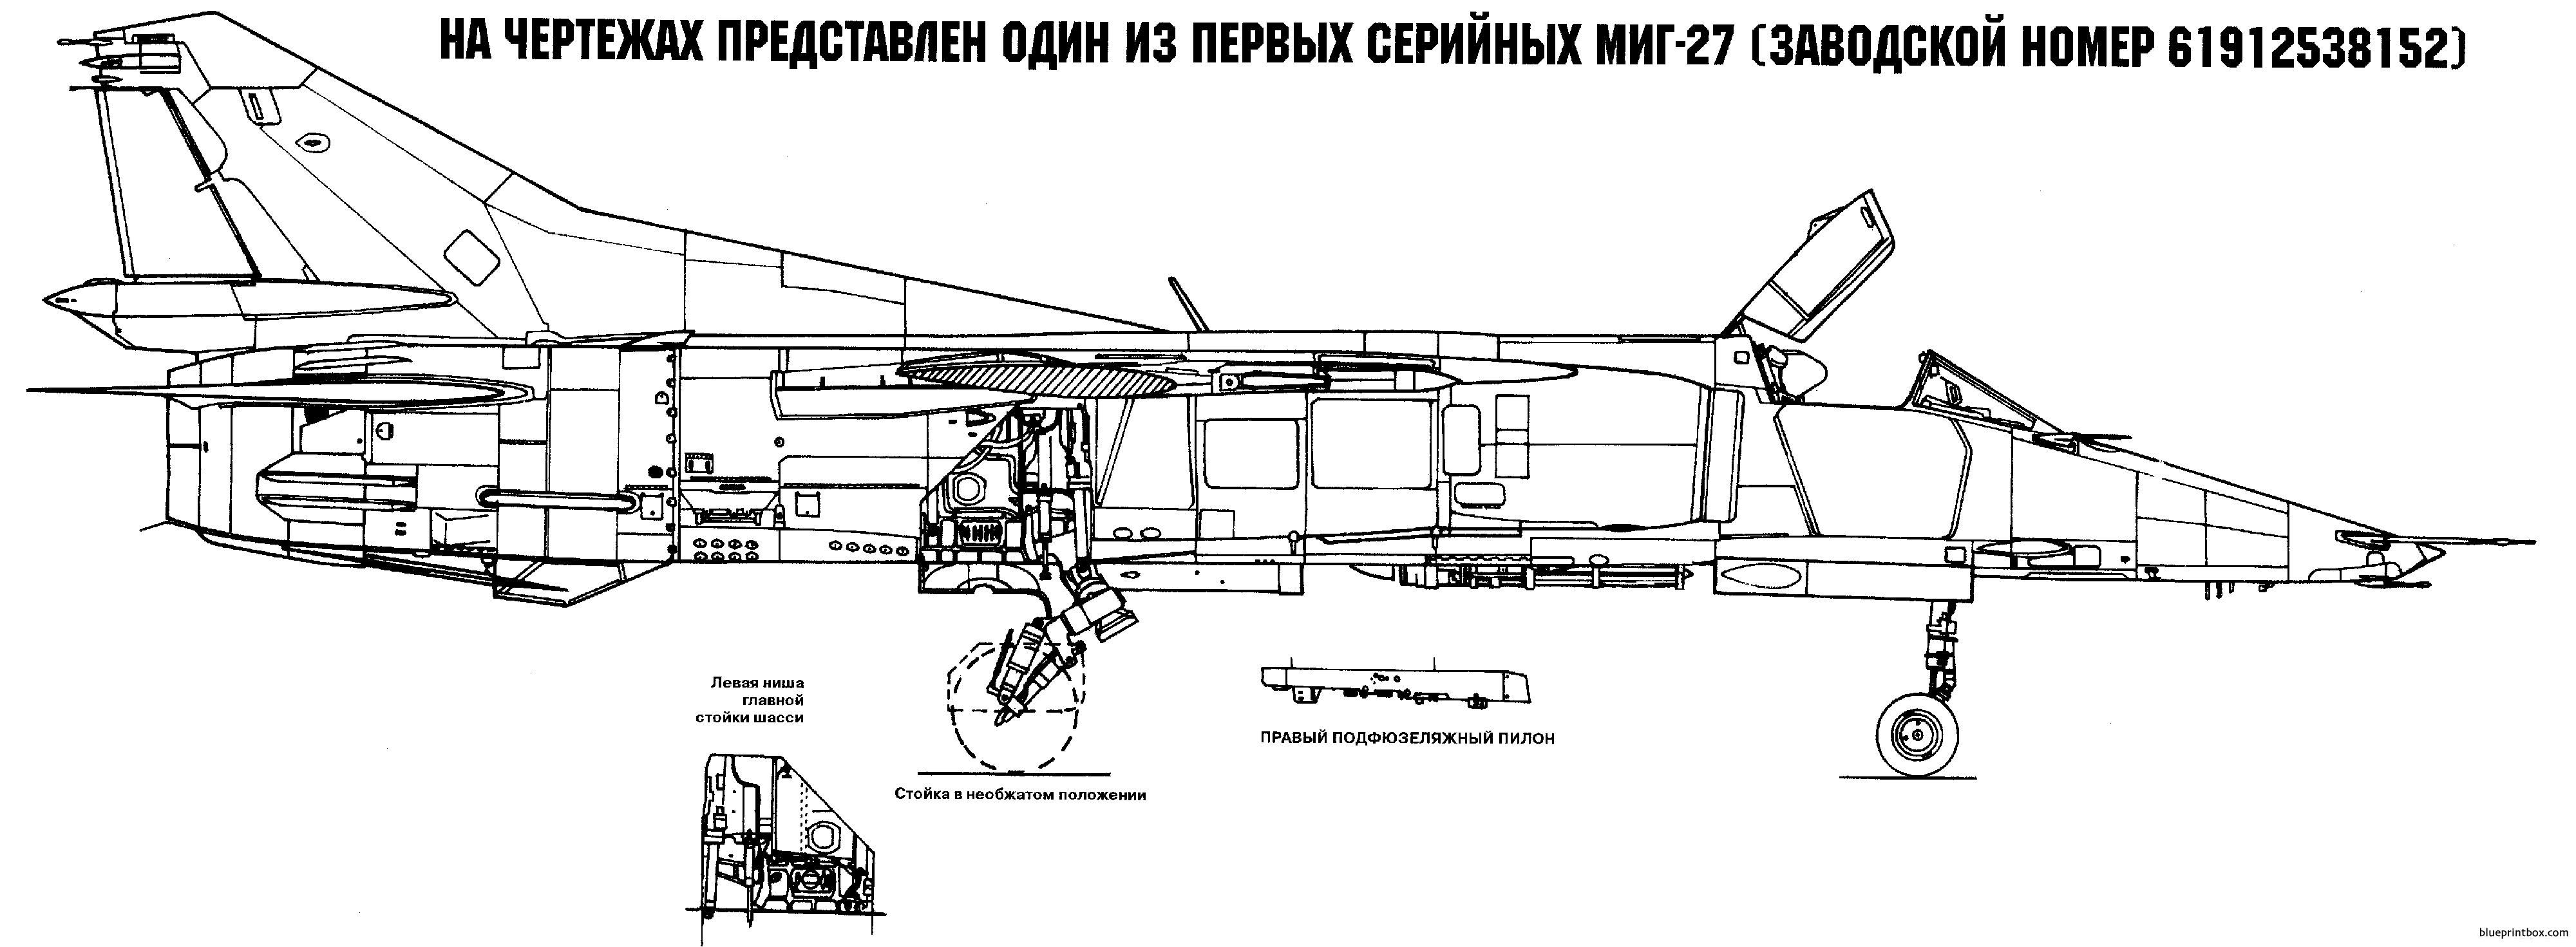 Mikoyan Gurevich Mig 27 2 - Blueprintbox Com